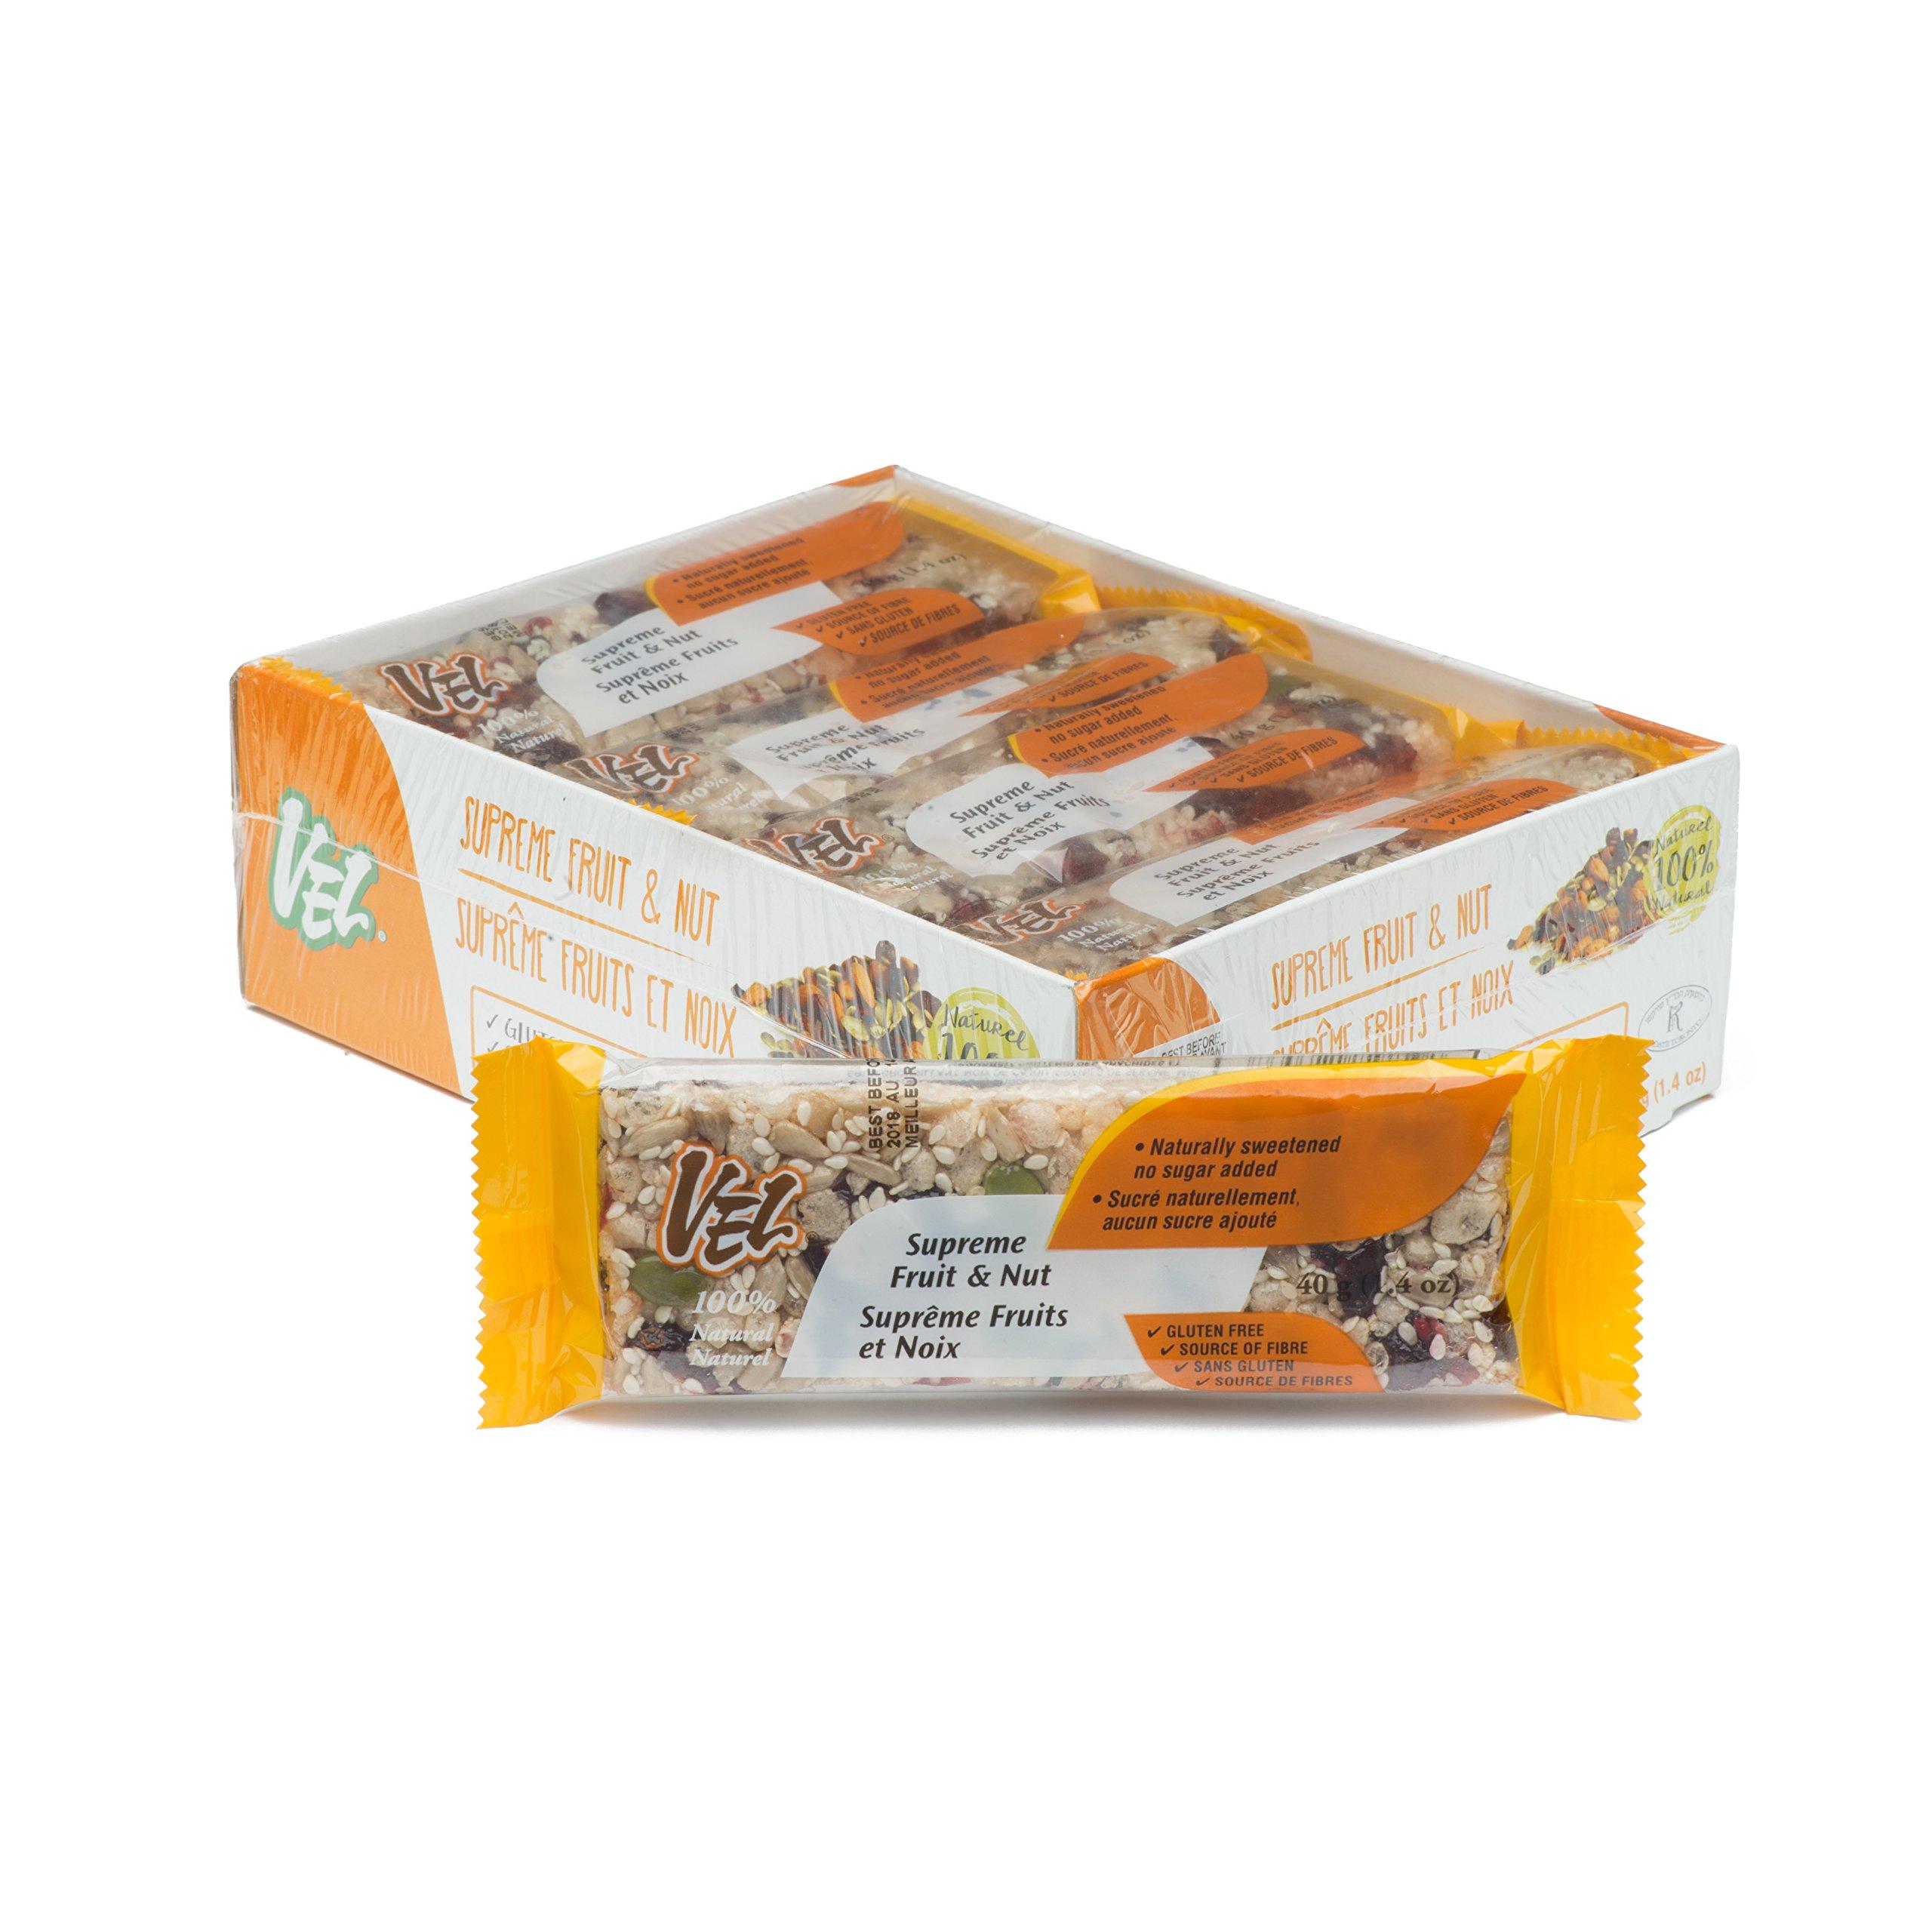 VEL Bars Supreme Fruit and Nut Bar, 12 Pack, 40 Gram/1.4 Ounce, No Gluten, No Soy, No Dairy, Source Of Fiber, Kosher